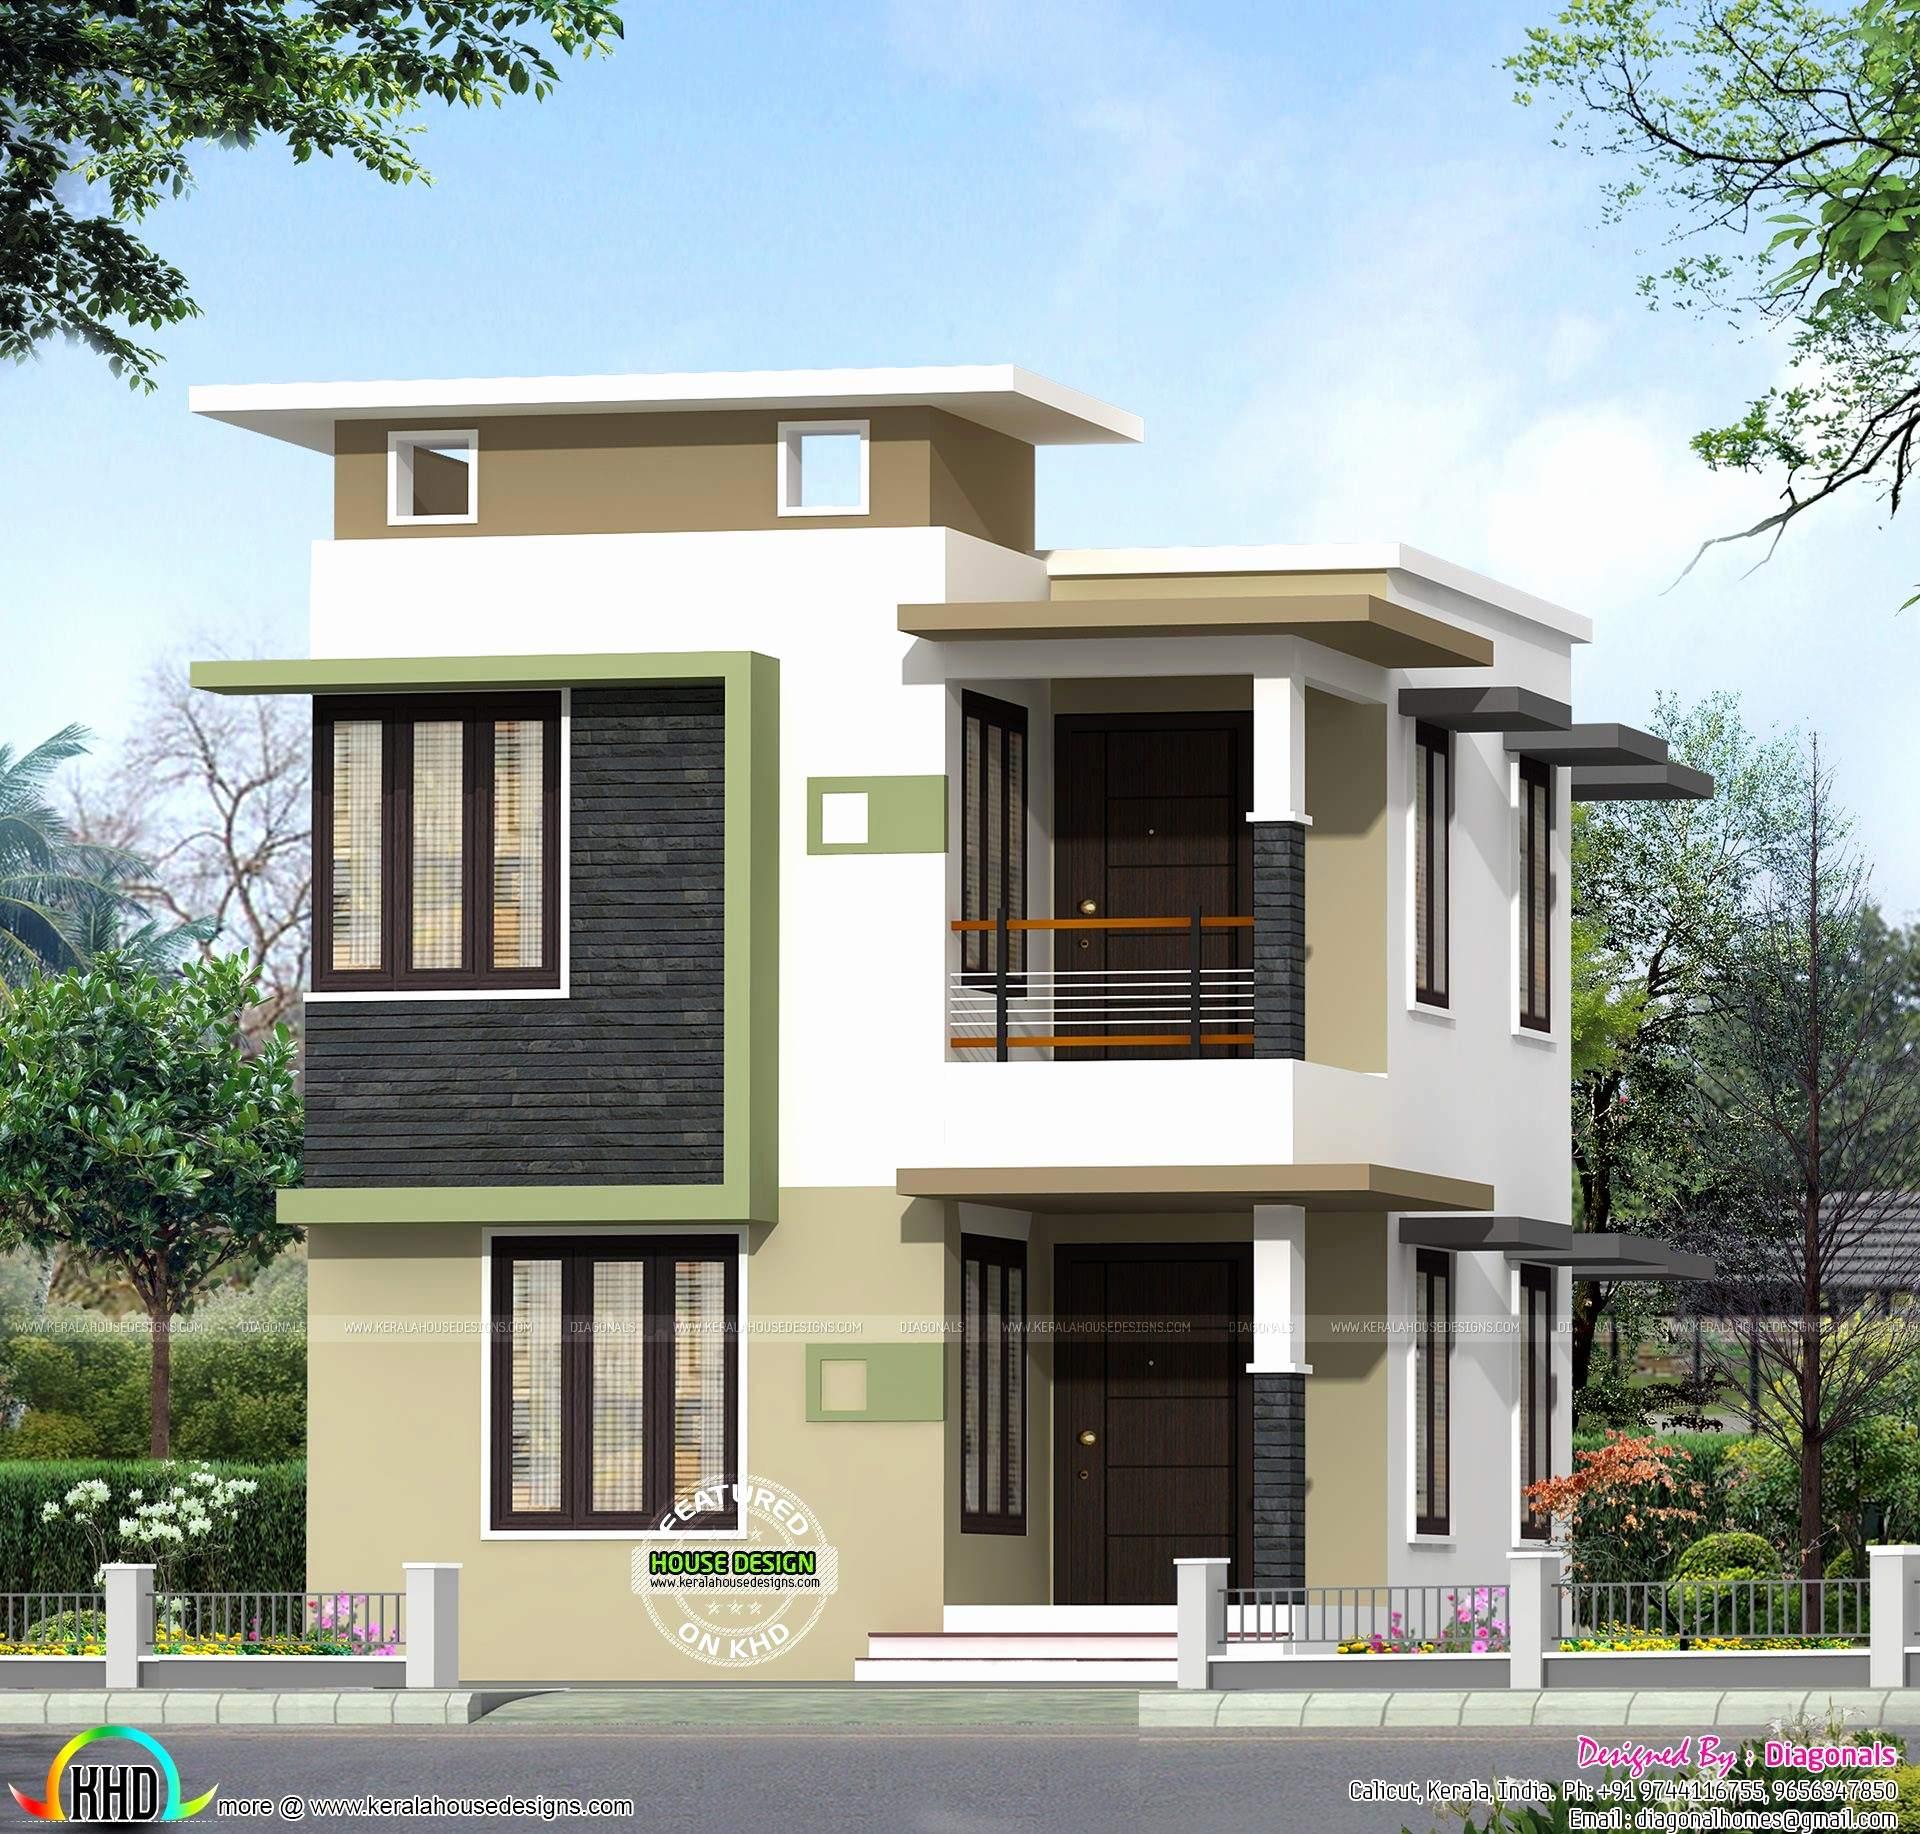 Home Design Ideas India: Readymade House Design India Duplex Designs Cocodanang